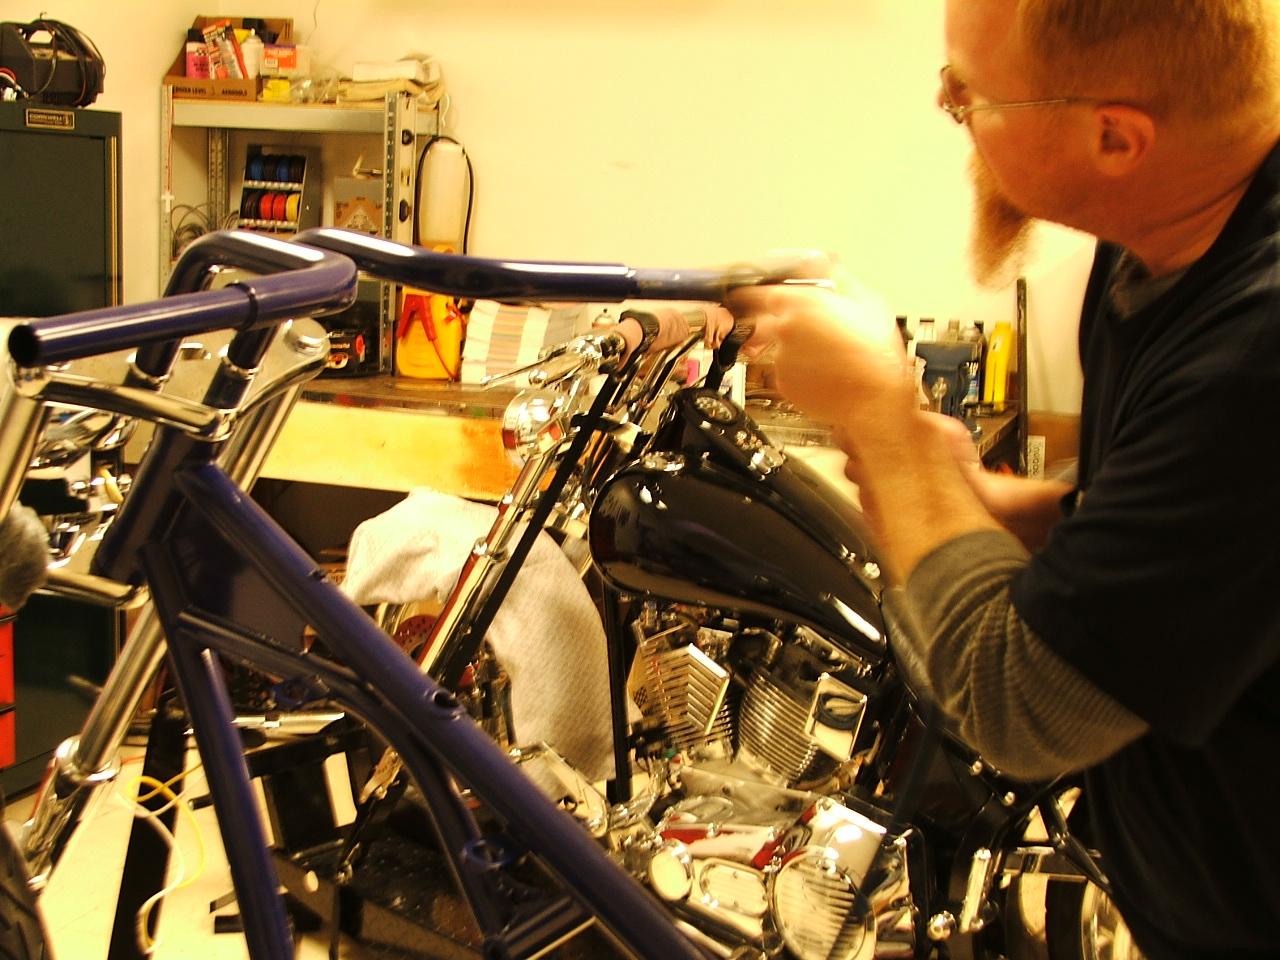 prject-bike-pictutes2-009